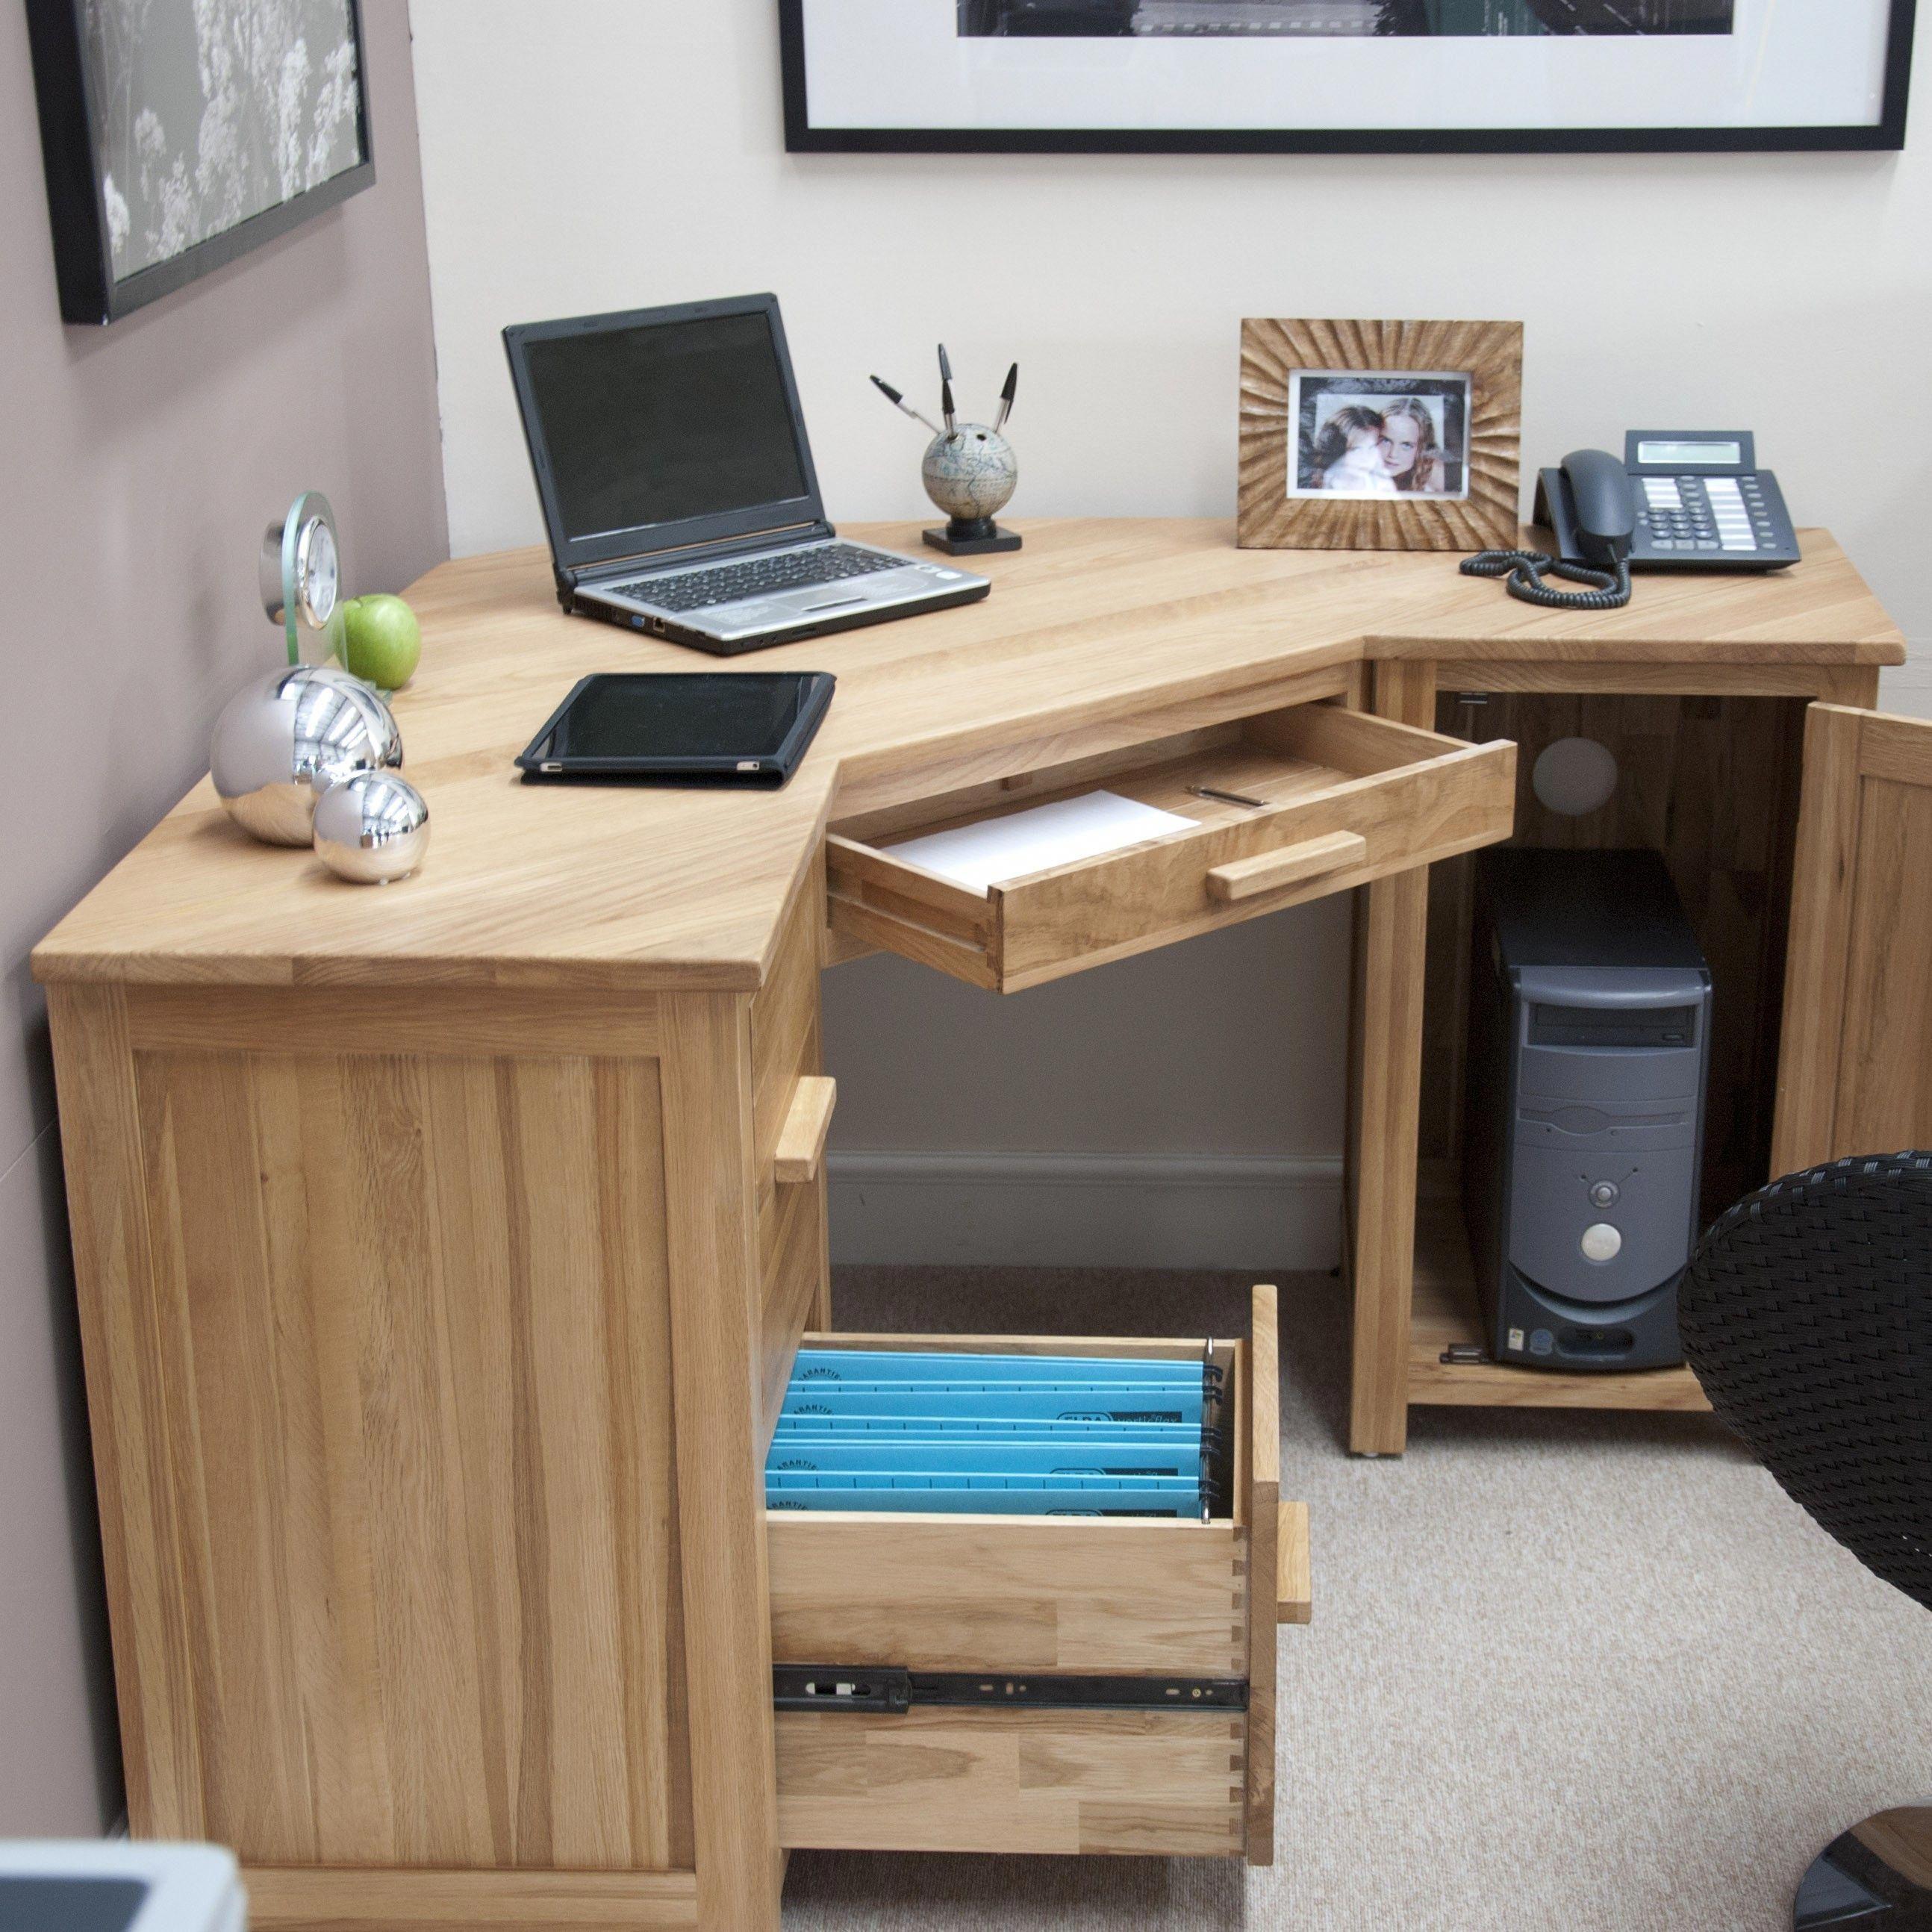 Adorable Design Ideas Of Office Furniture With Curve Shape Corner